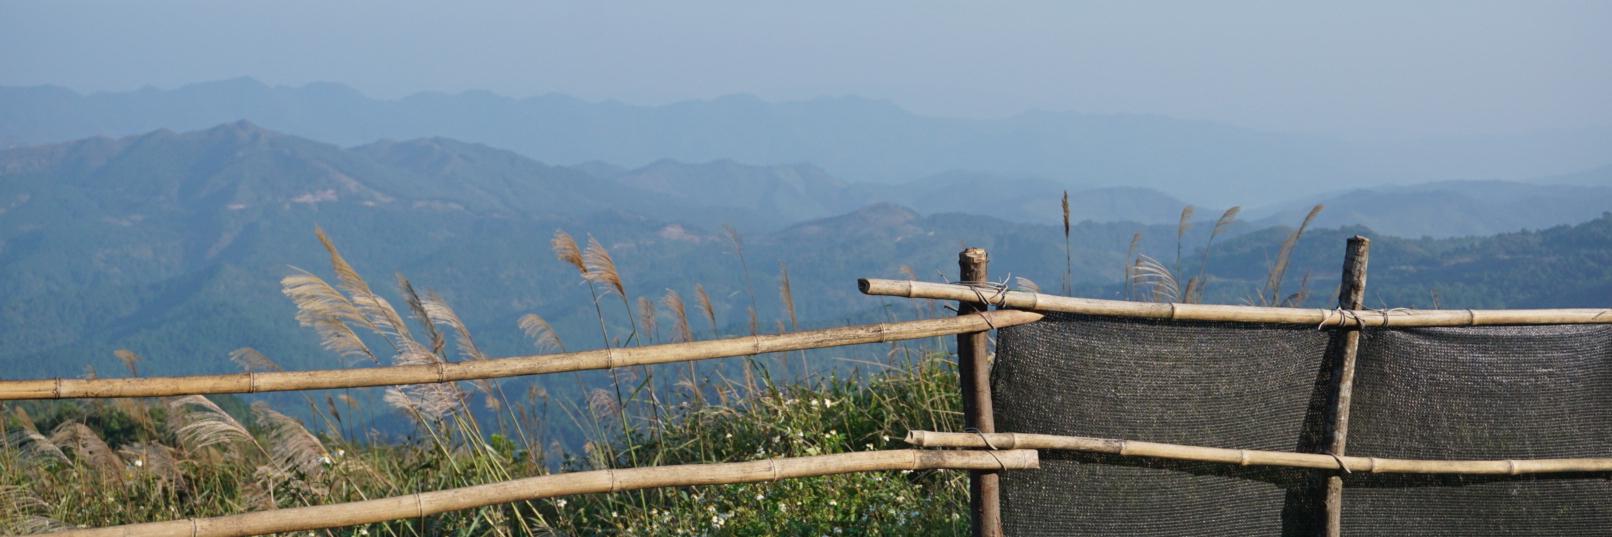 https://gody.vn/blog/ph.thao_1102_yh4547/post/review-thien-duong-co-lau-binh-lieu-2n2d-8329